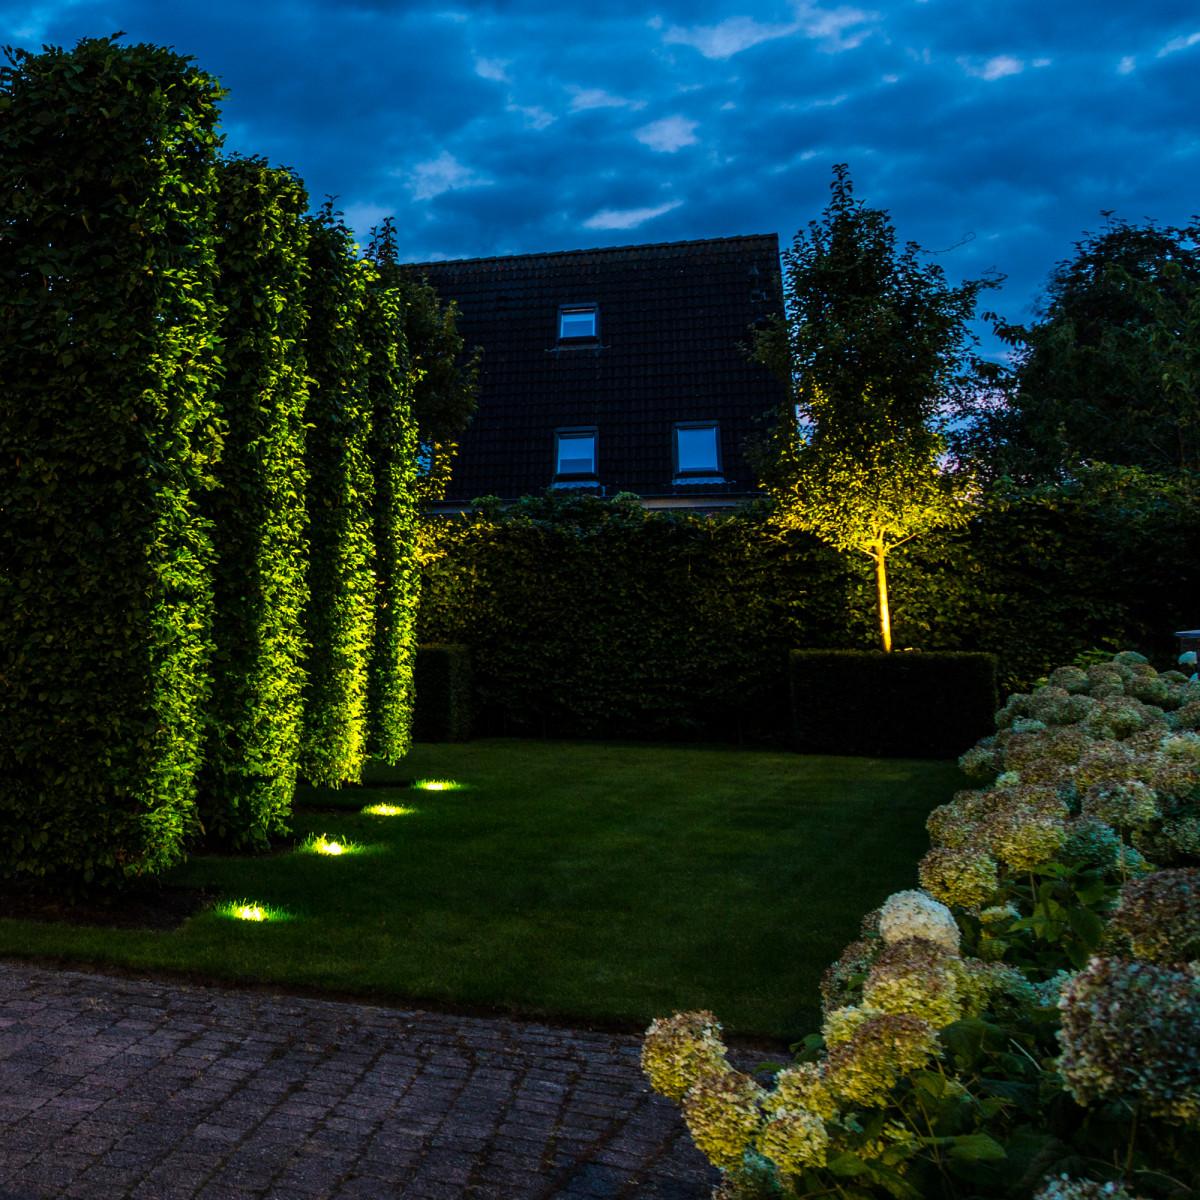 RVS Grondspot LED Ø11 Rond Zwart